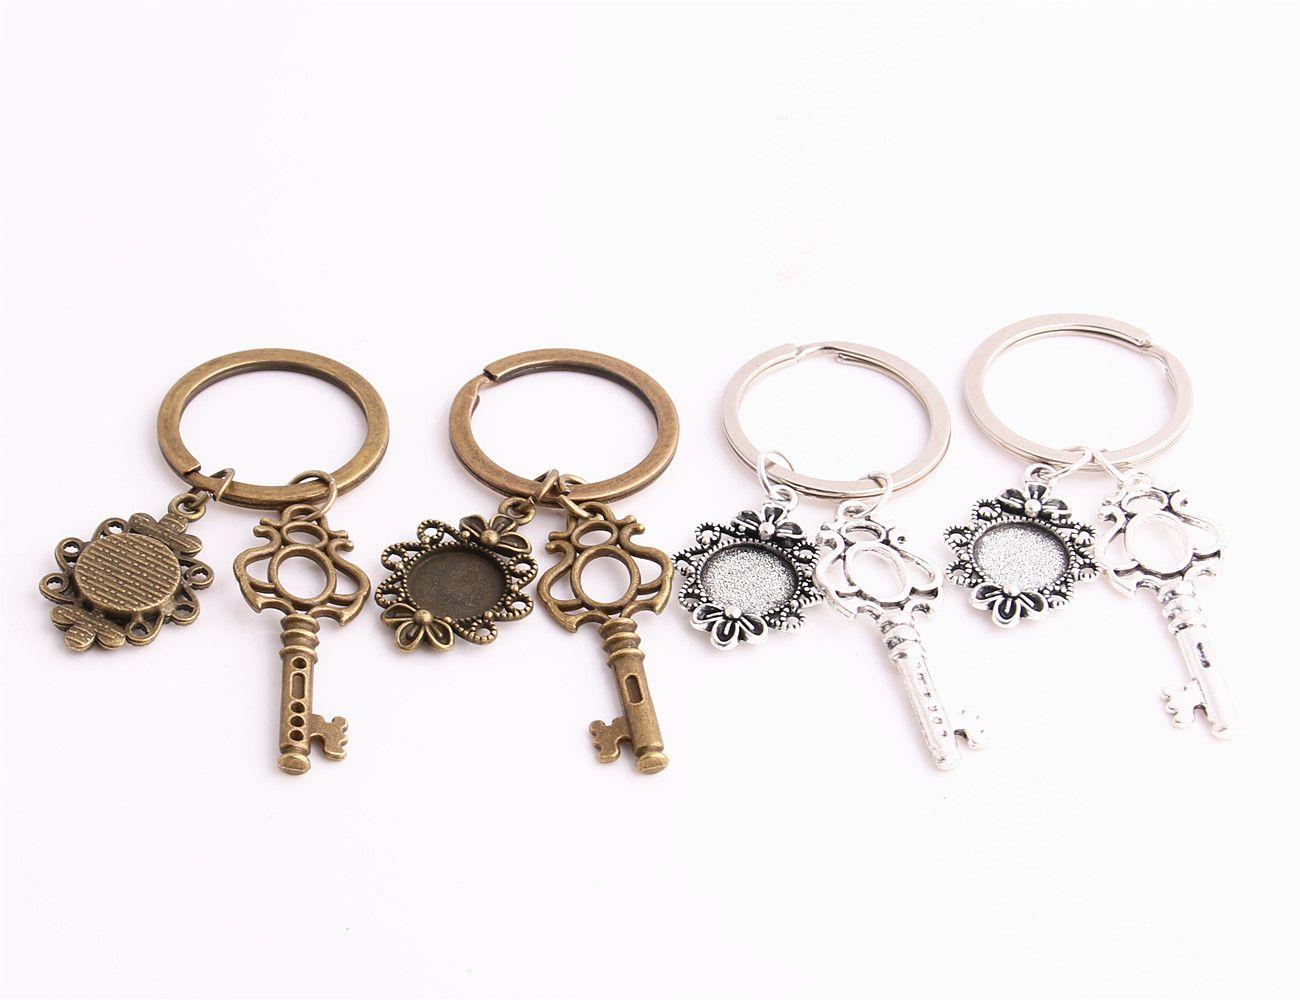 SWEET BELL Metal Alloy Zinc Key Chain Fit Round 12.5mm Cabochon Base Key Charm Pendant Jewelry Making C0898